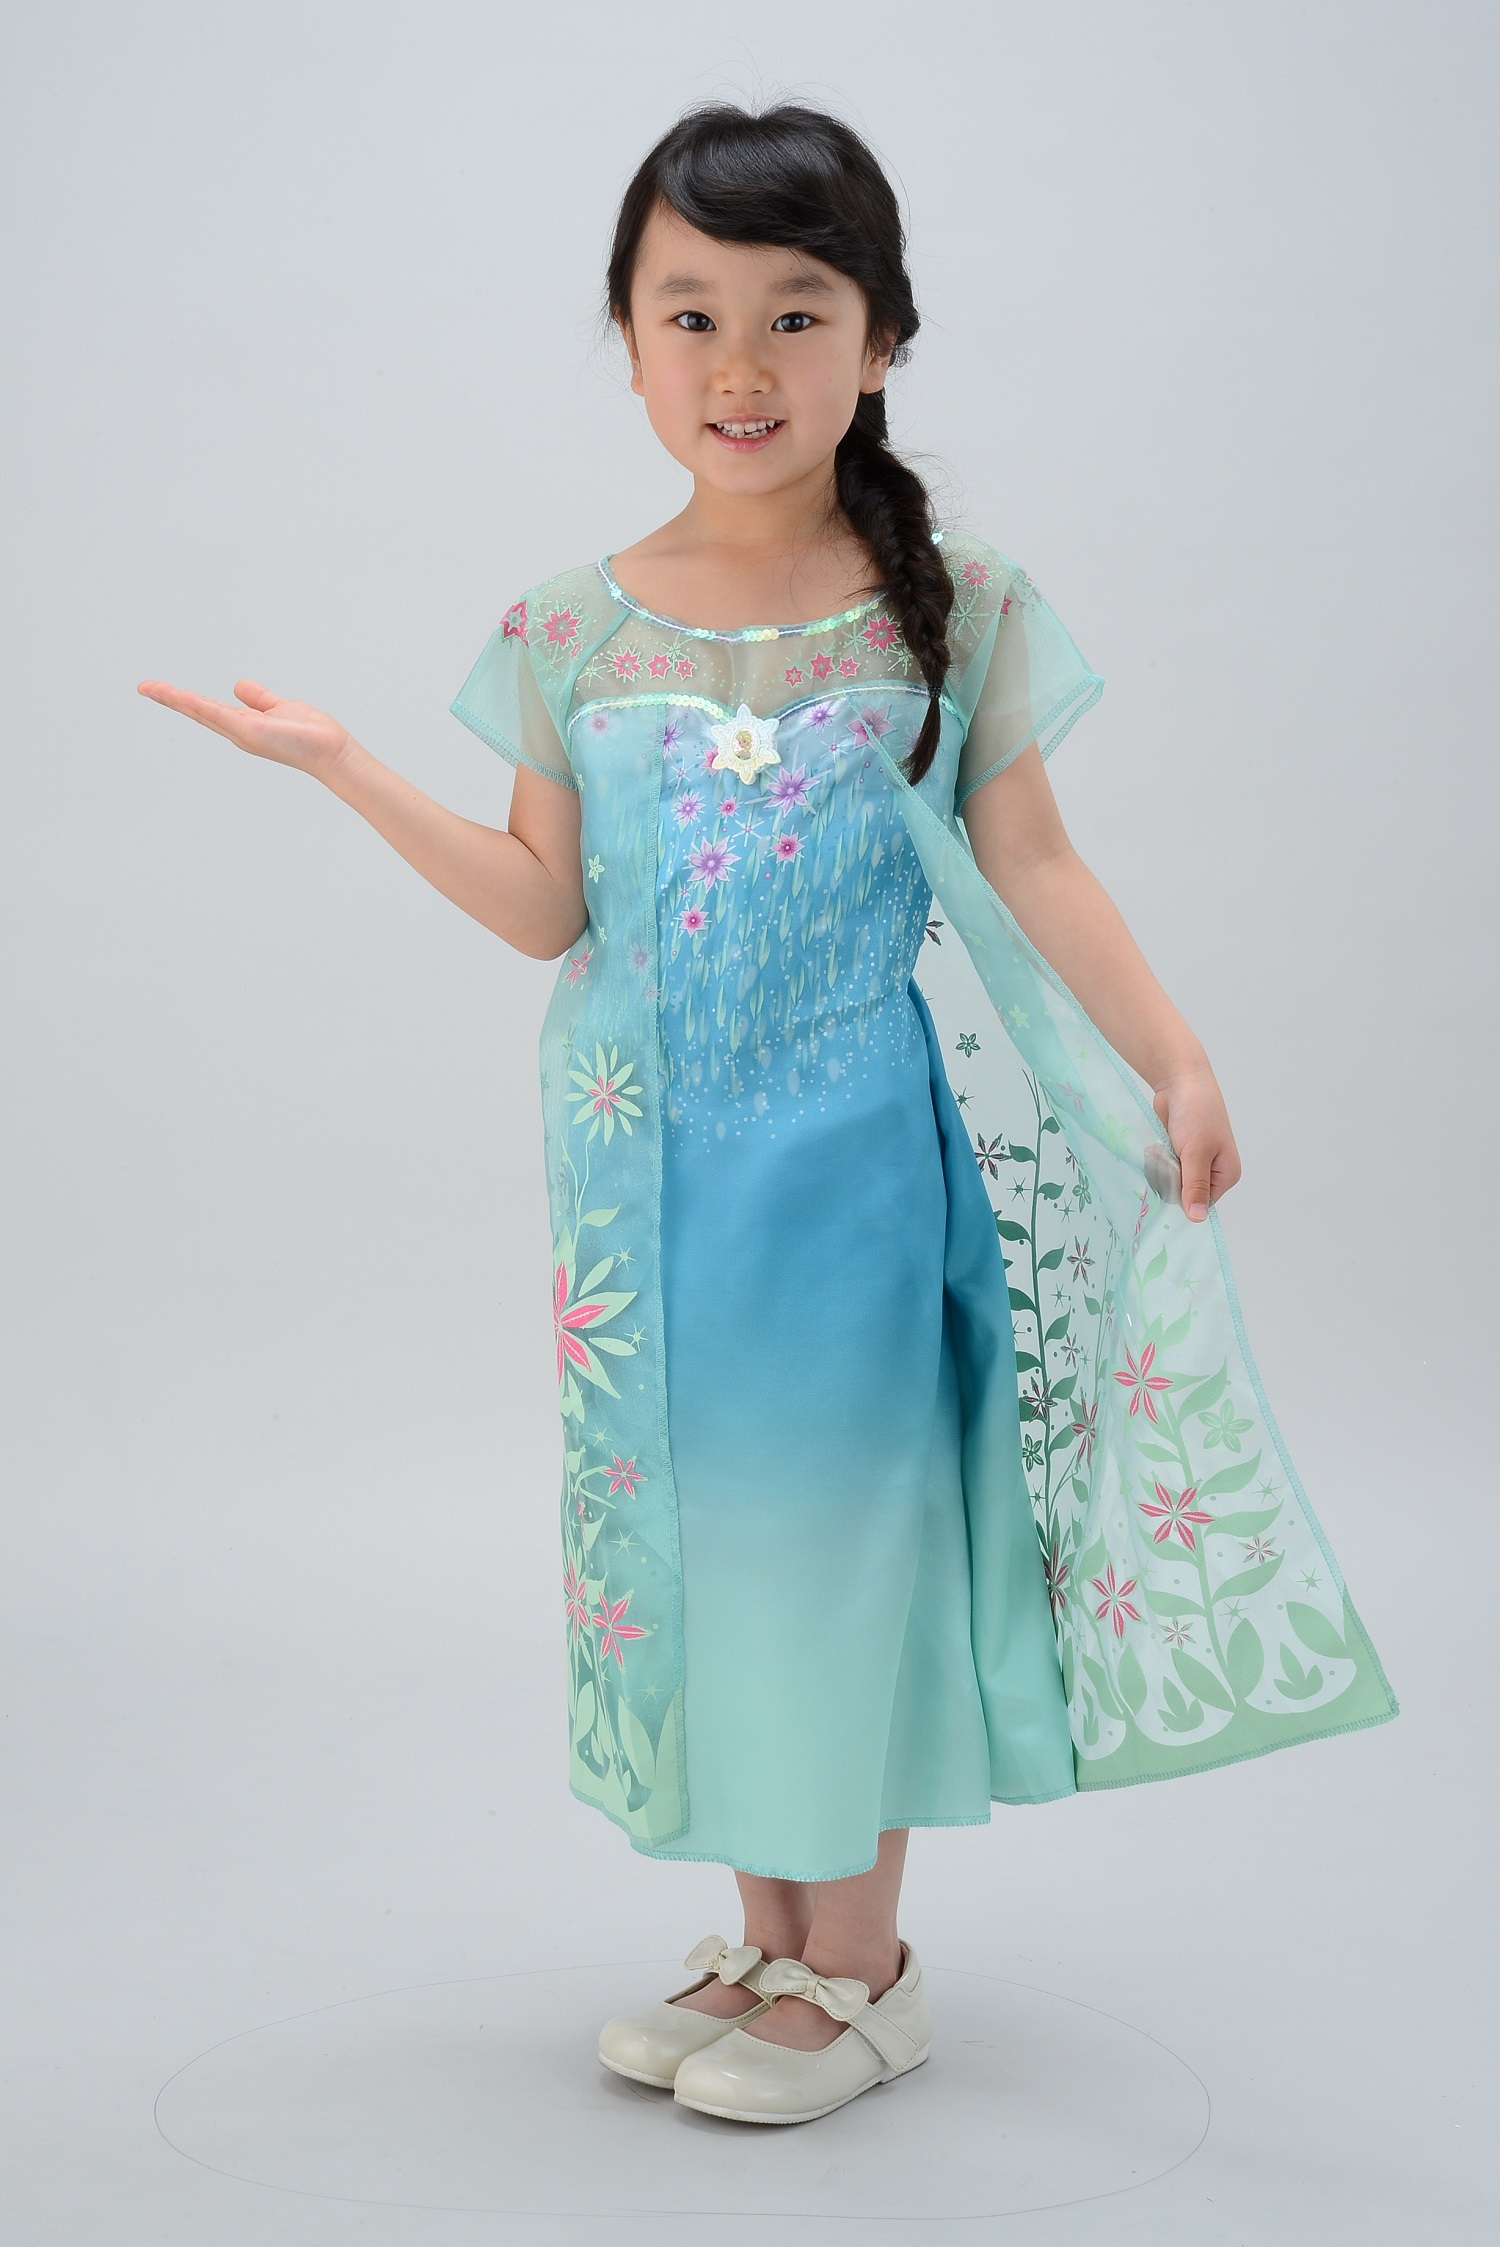 92dfa1ff6ca51 タカラトミー アナと雪の女王 おしゃれドレス エルサのサプライズ 3800円 ※靴